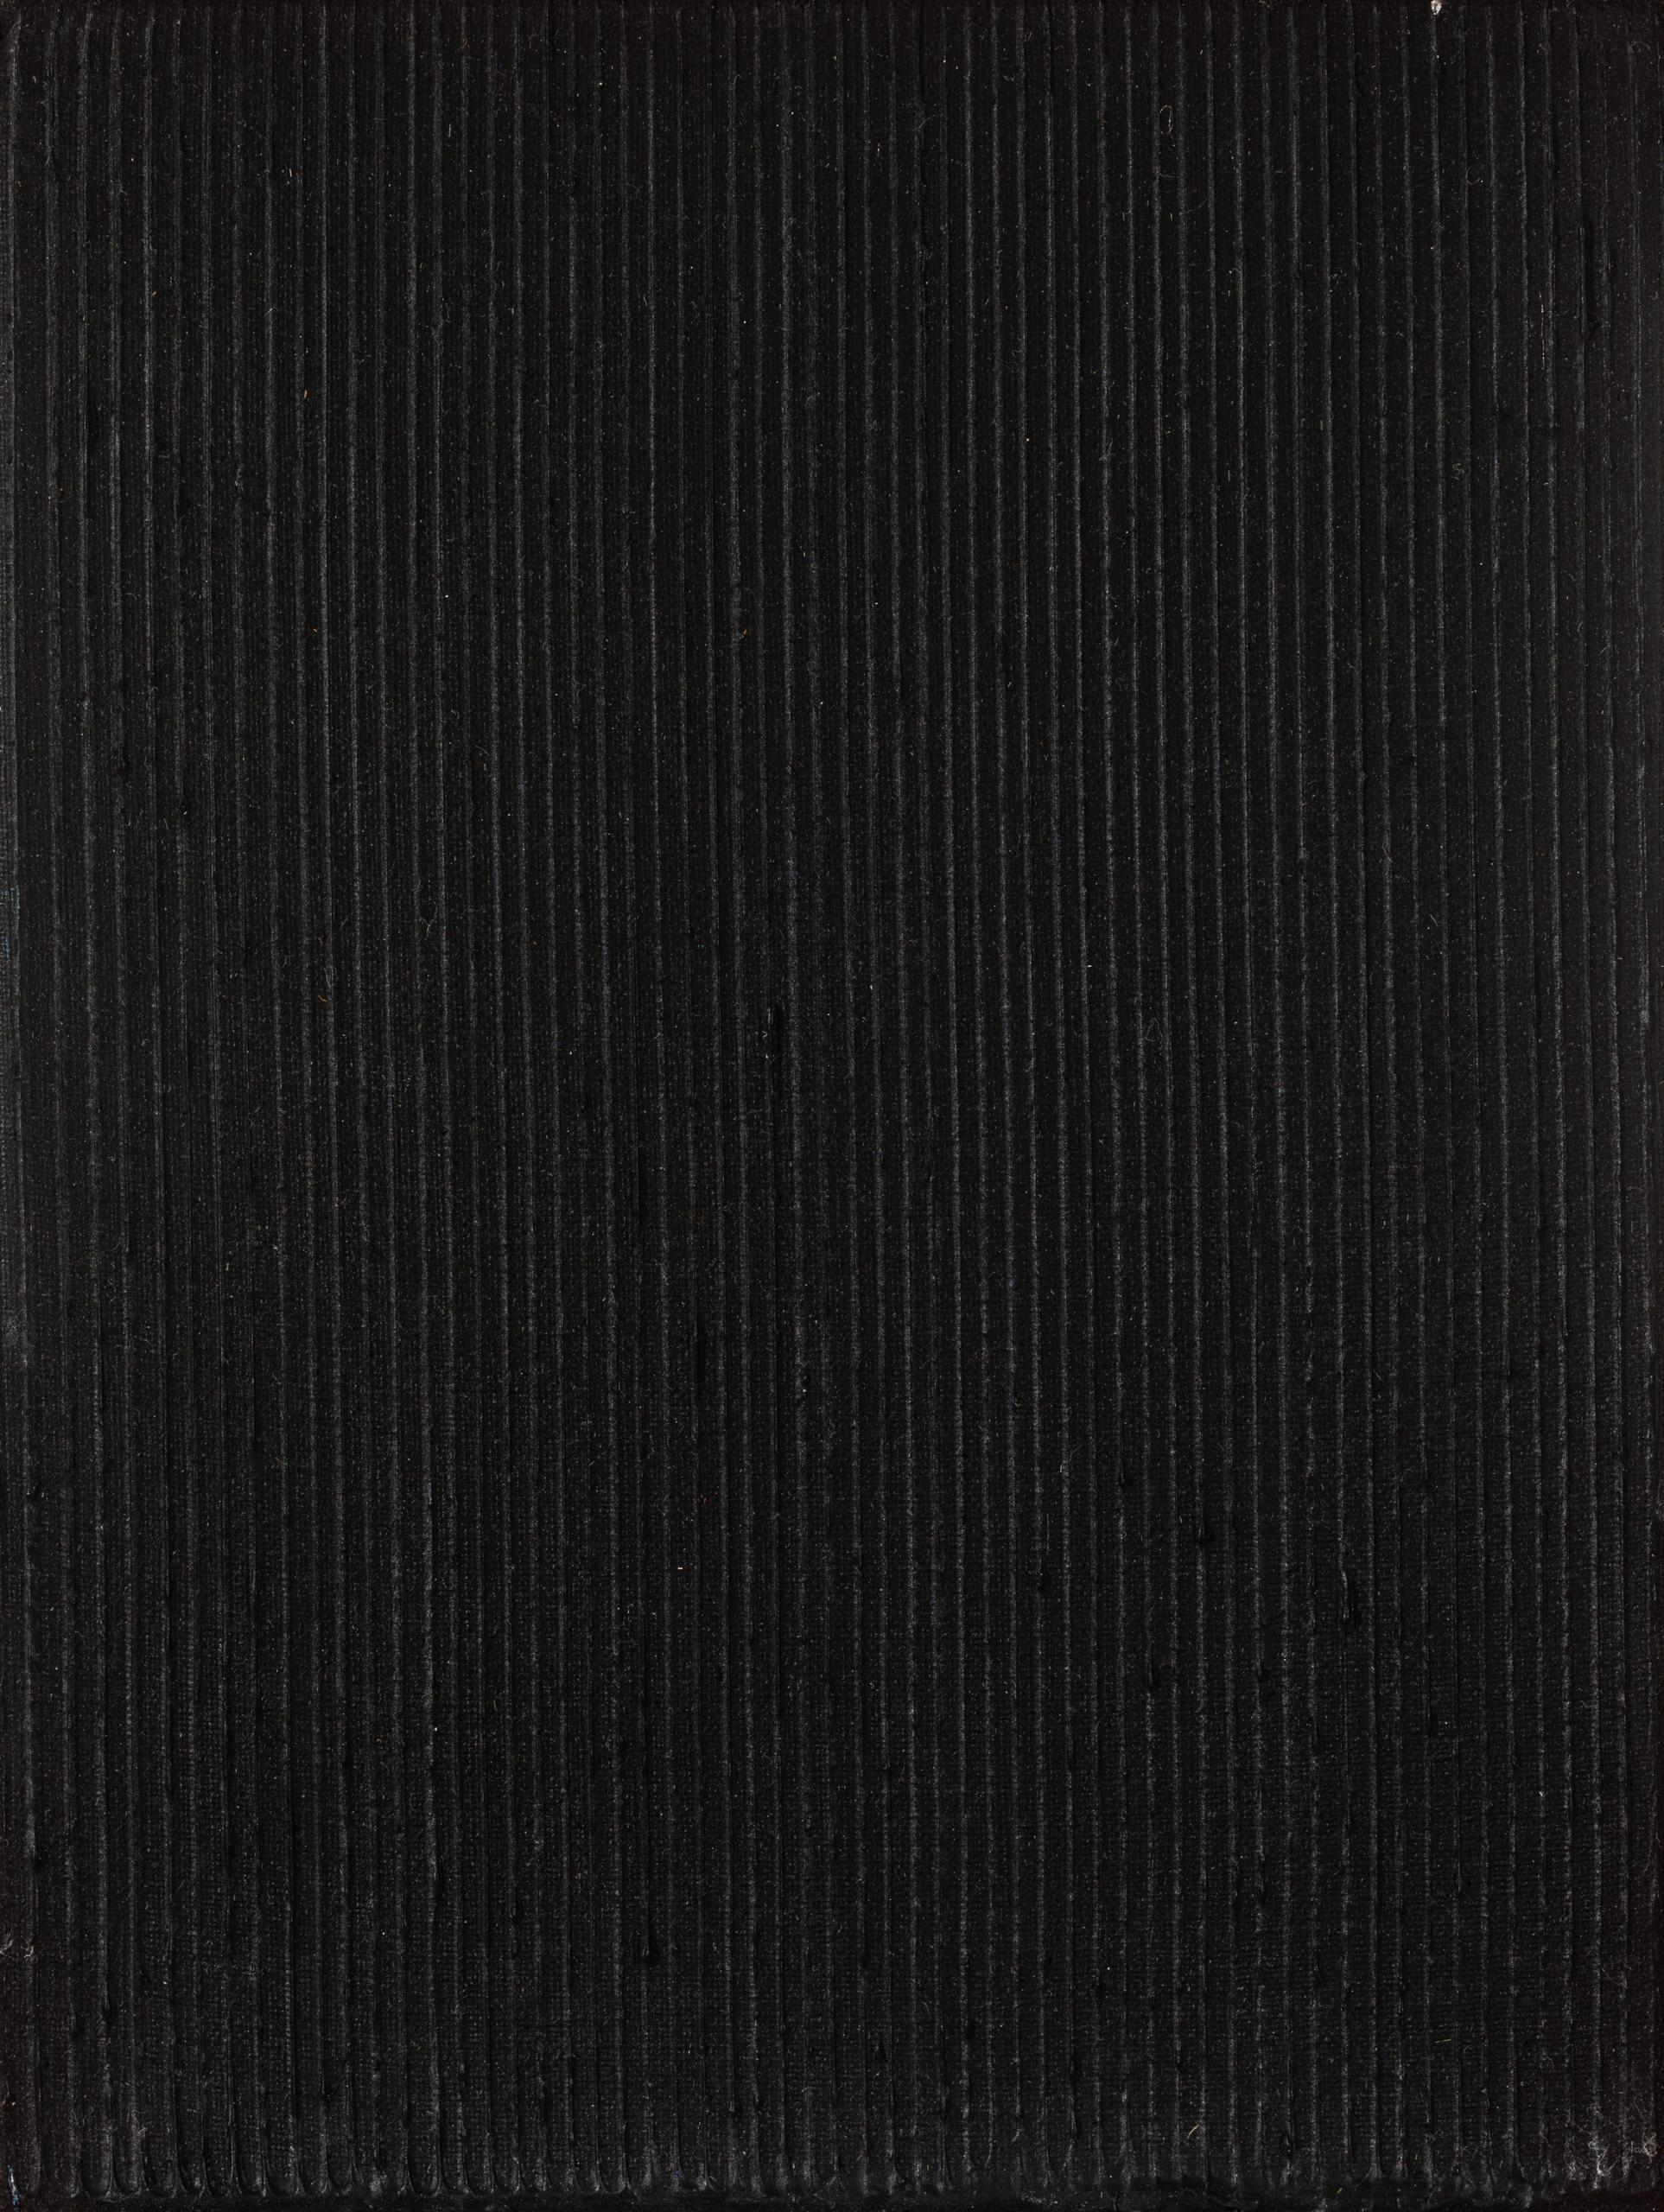 Jakob Gasteiger, Ohne Titel / untitled